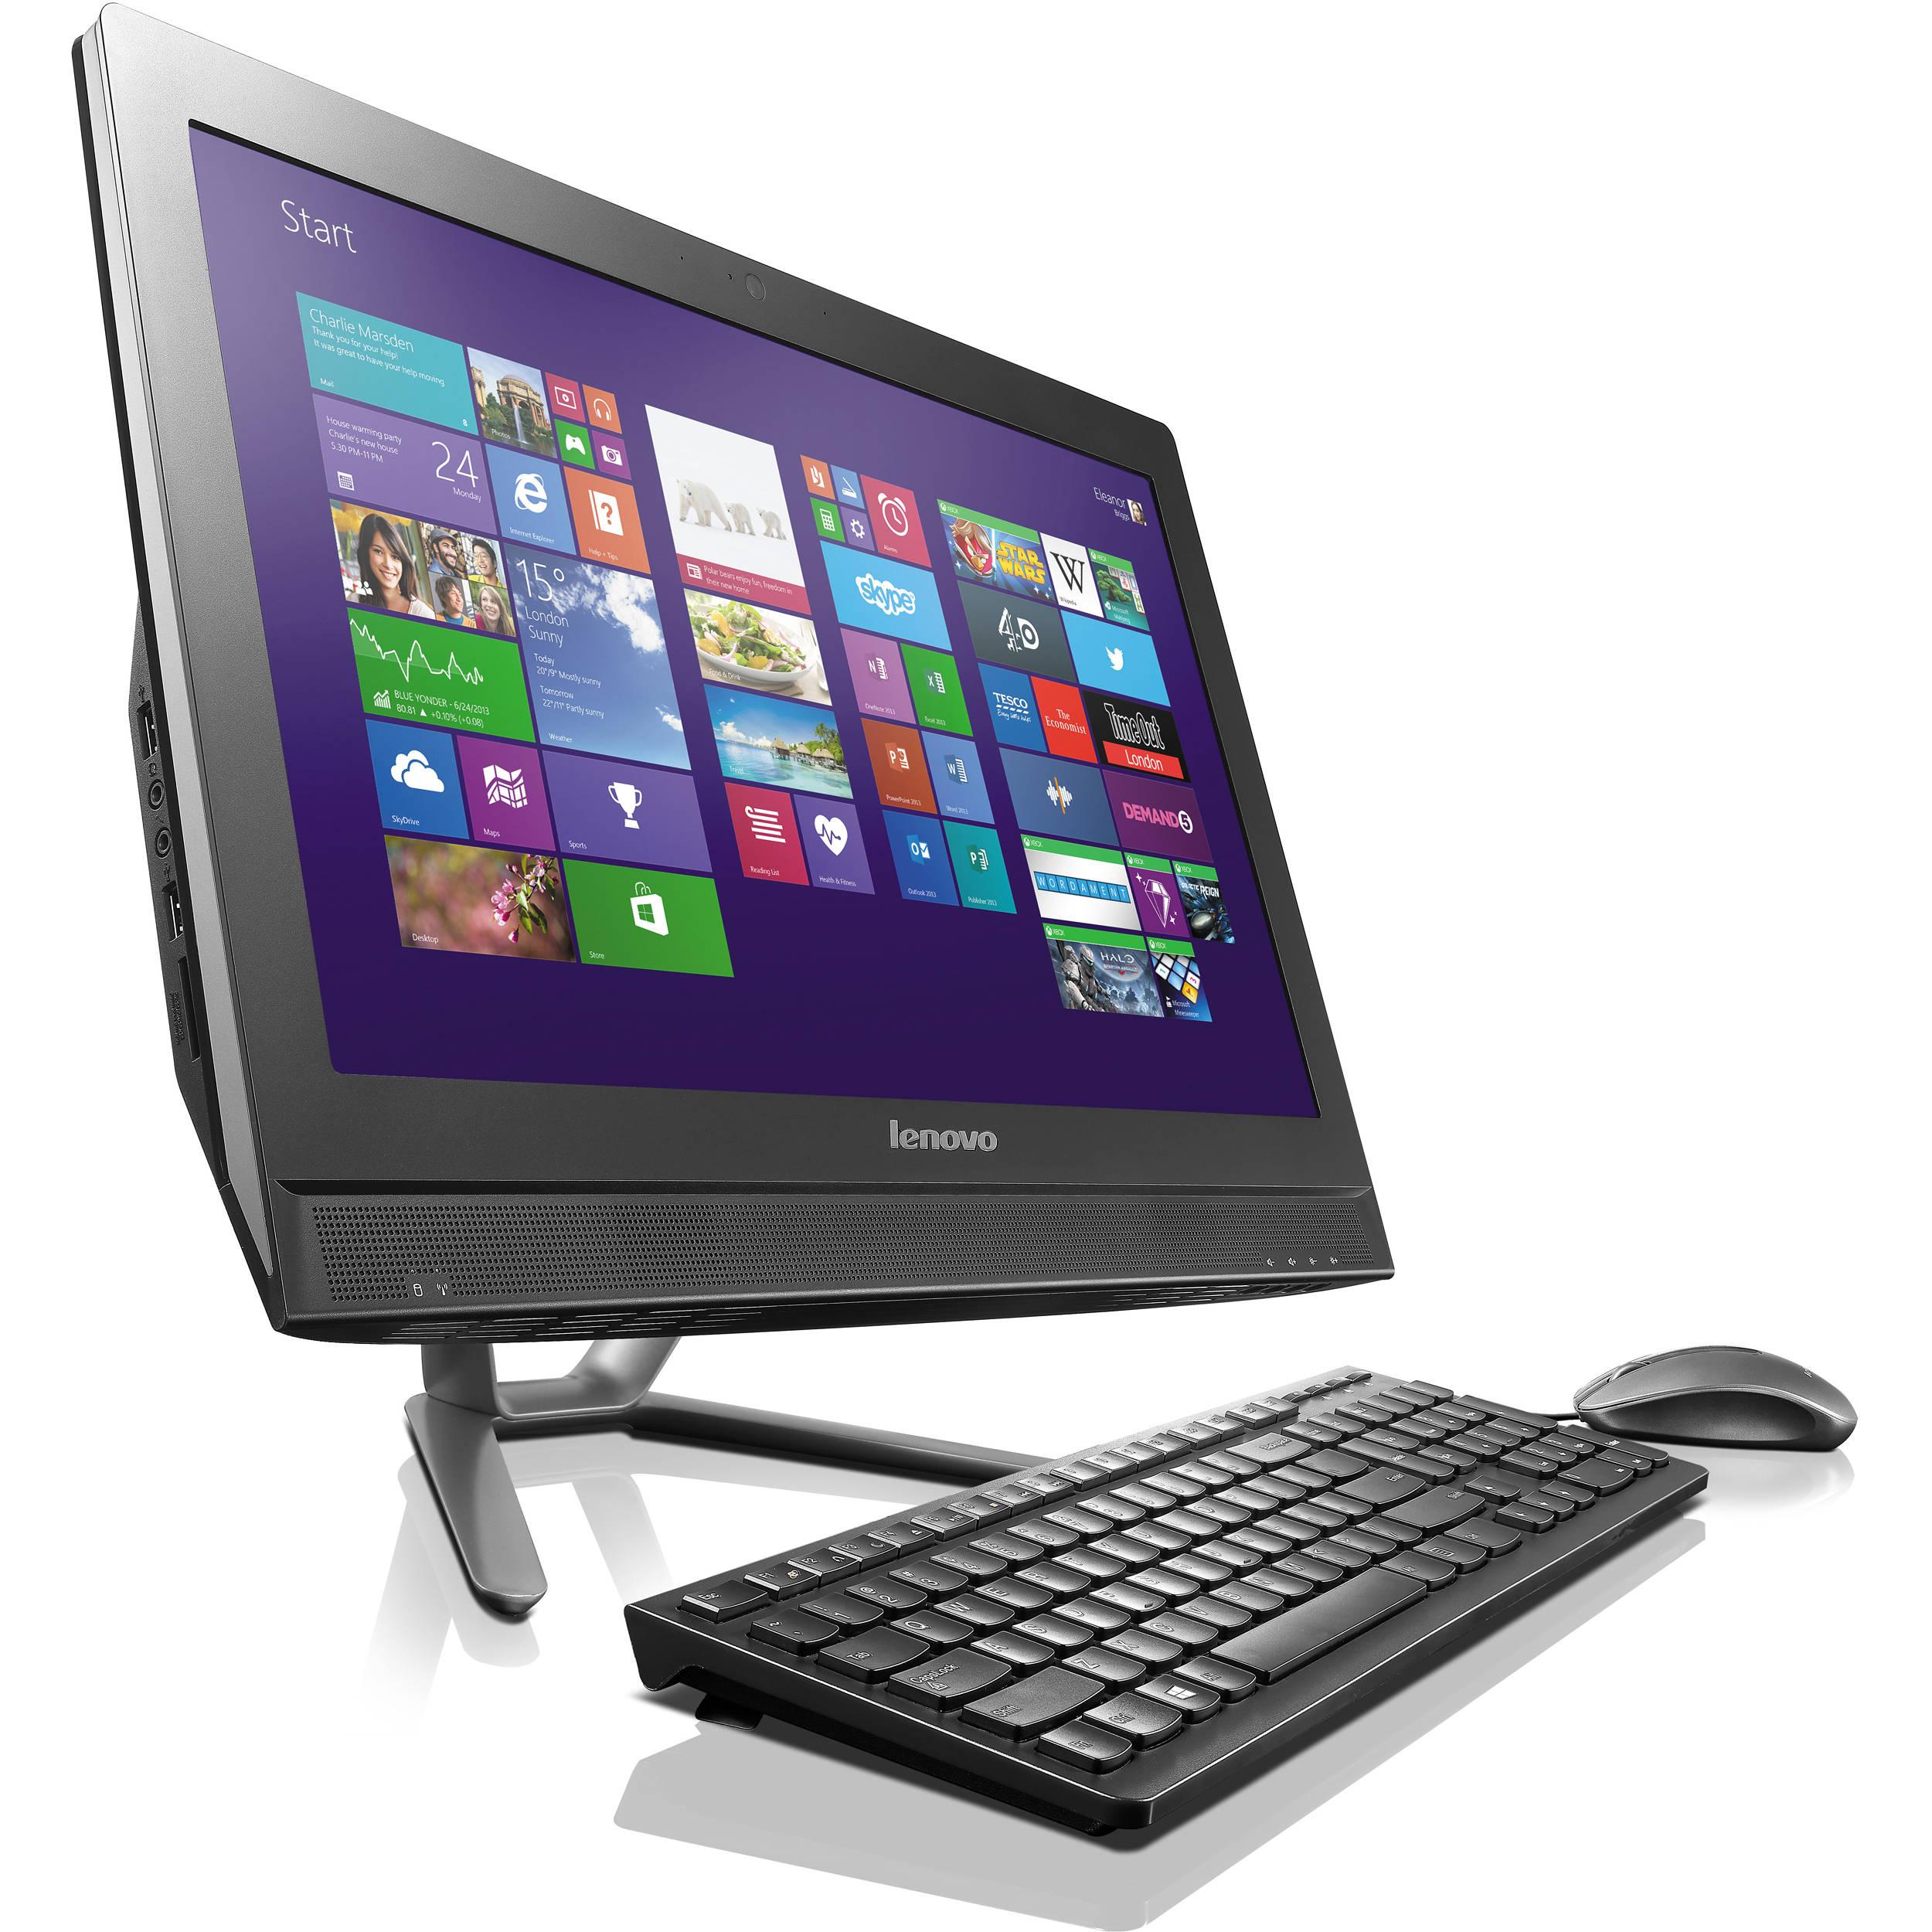 10 Best All In One Desktop Computer 2018 | Best Laptops |Lenovo Desktop All In One